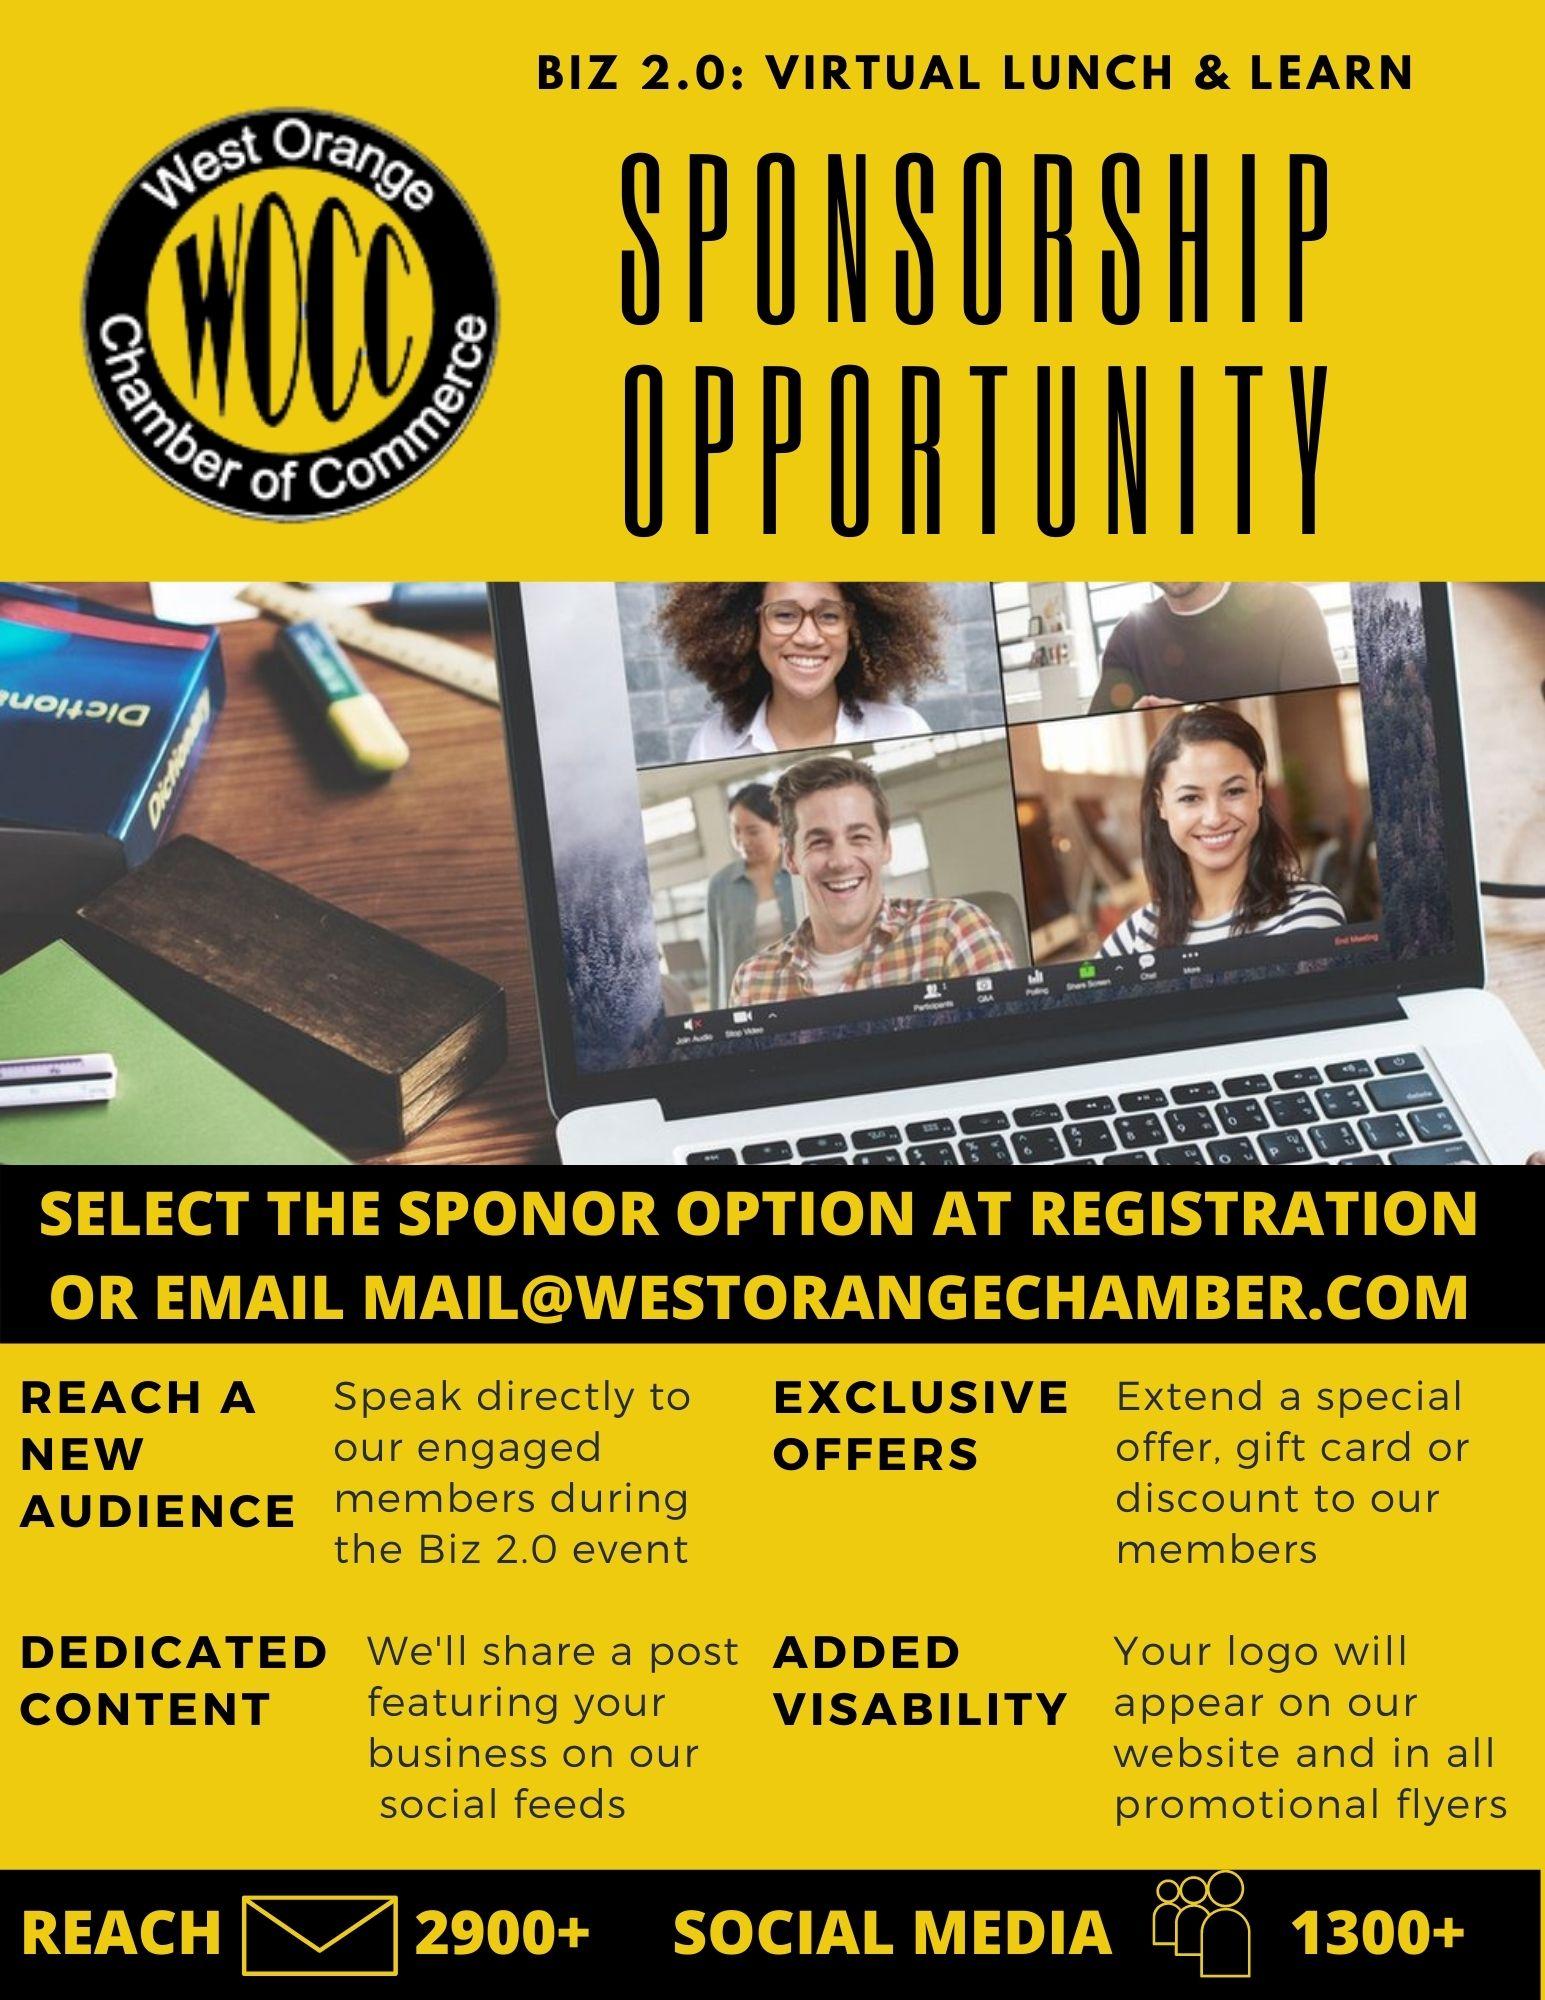 WOCC-Biz-2.0-Sponsorship-.jpg